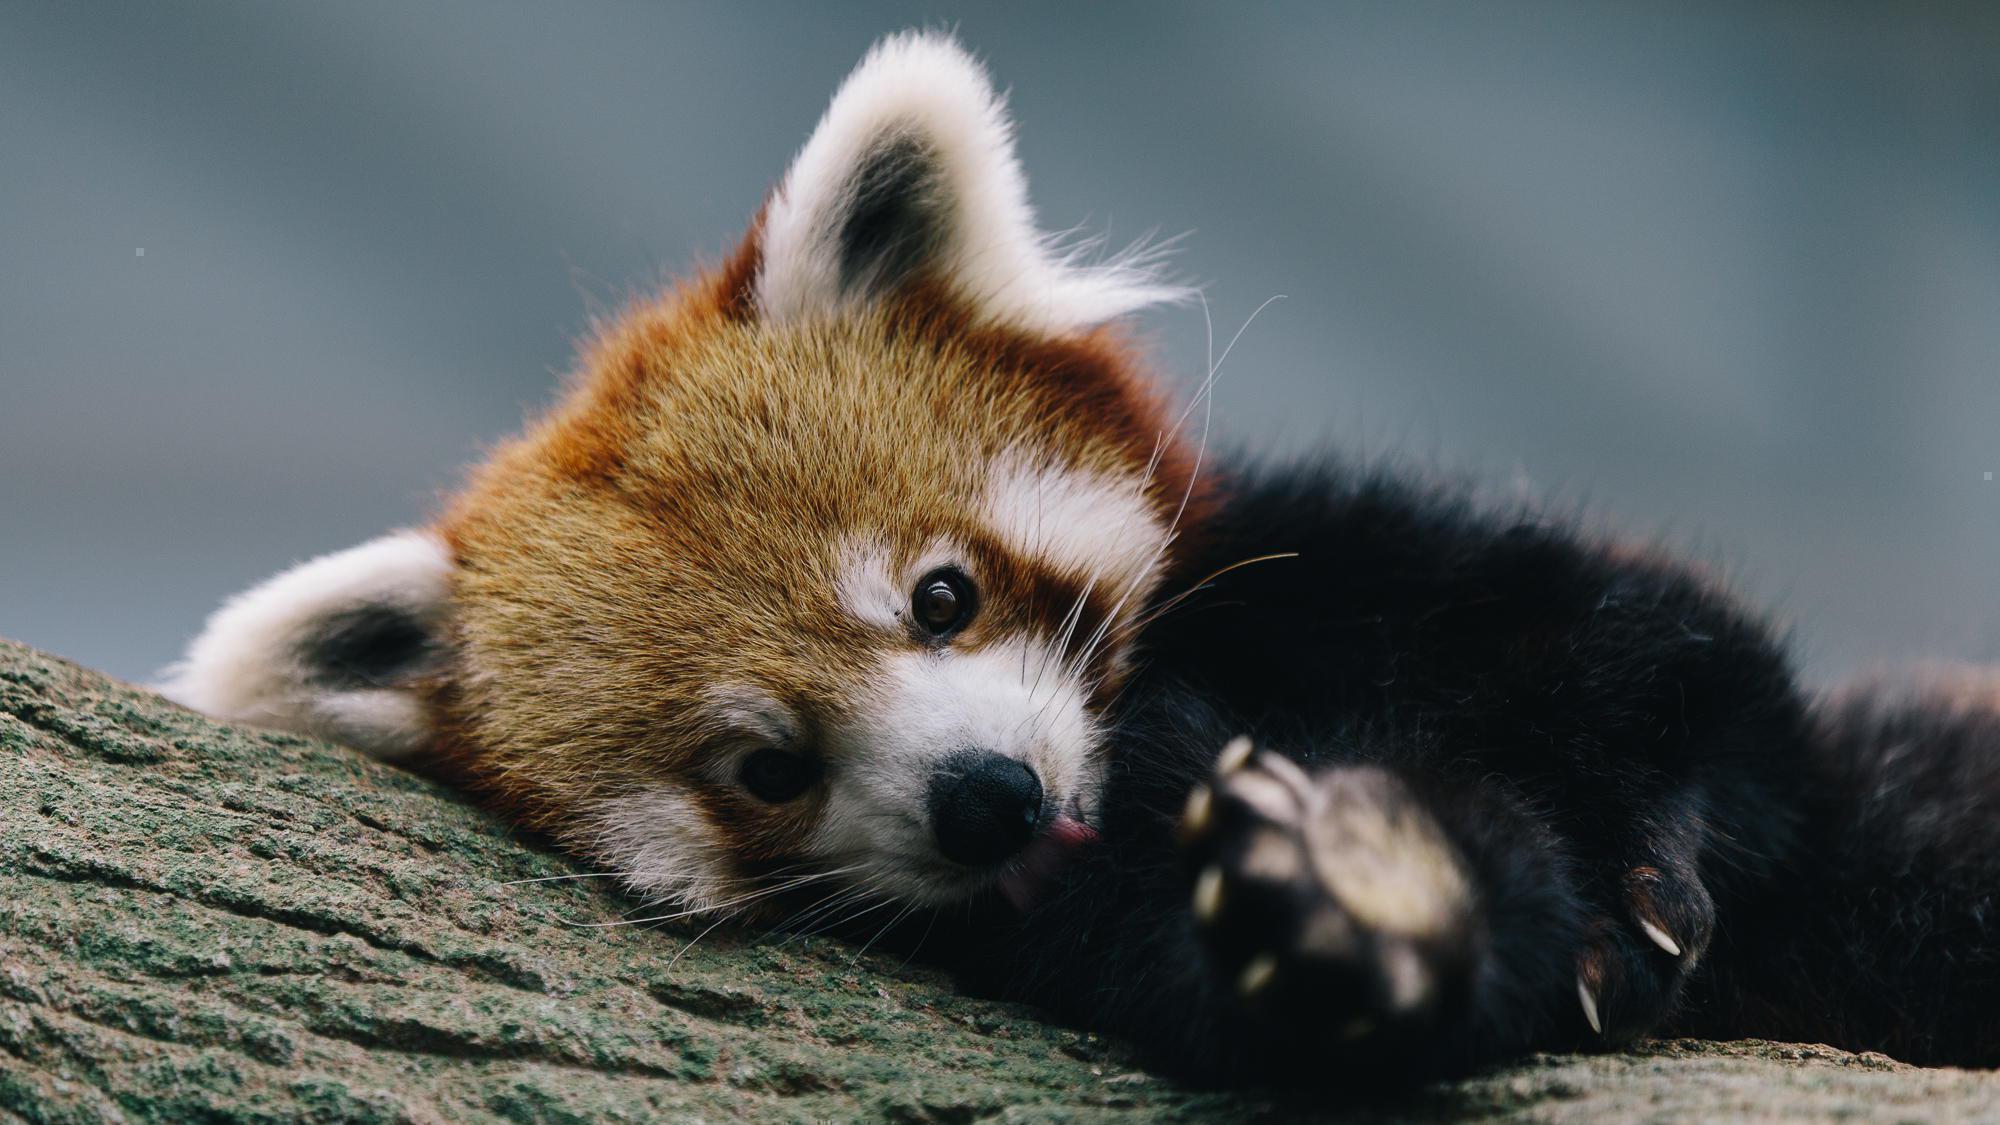 Download Sad Baby Red Panda Wallpaper - Red Panda On Itl.cat